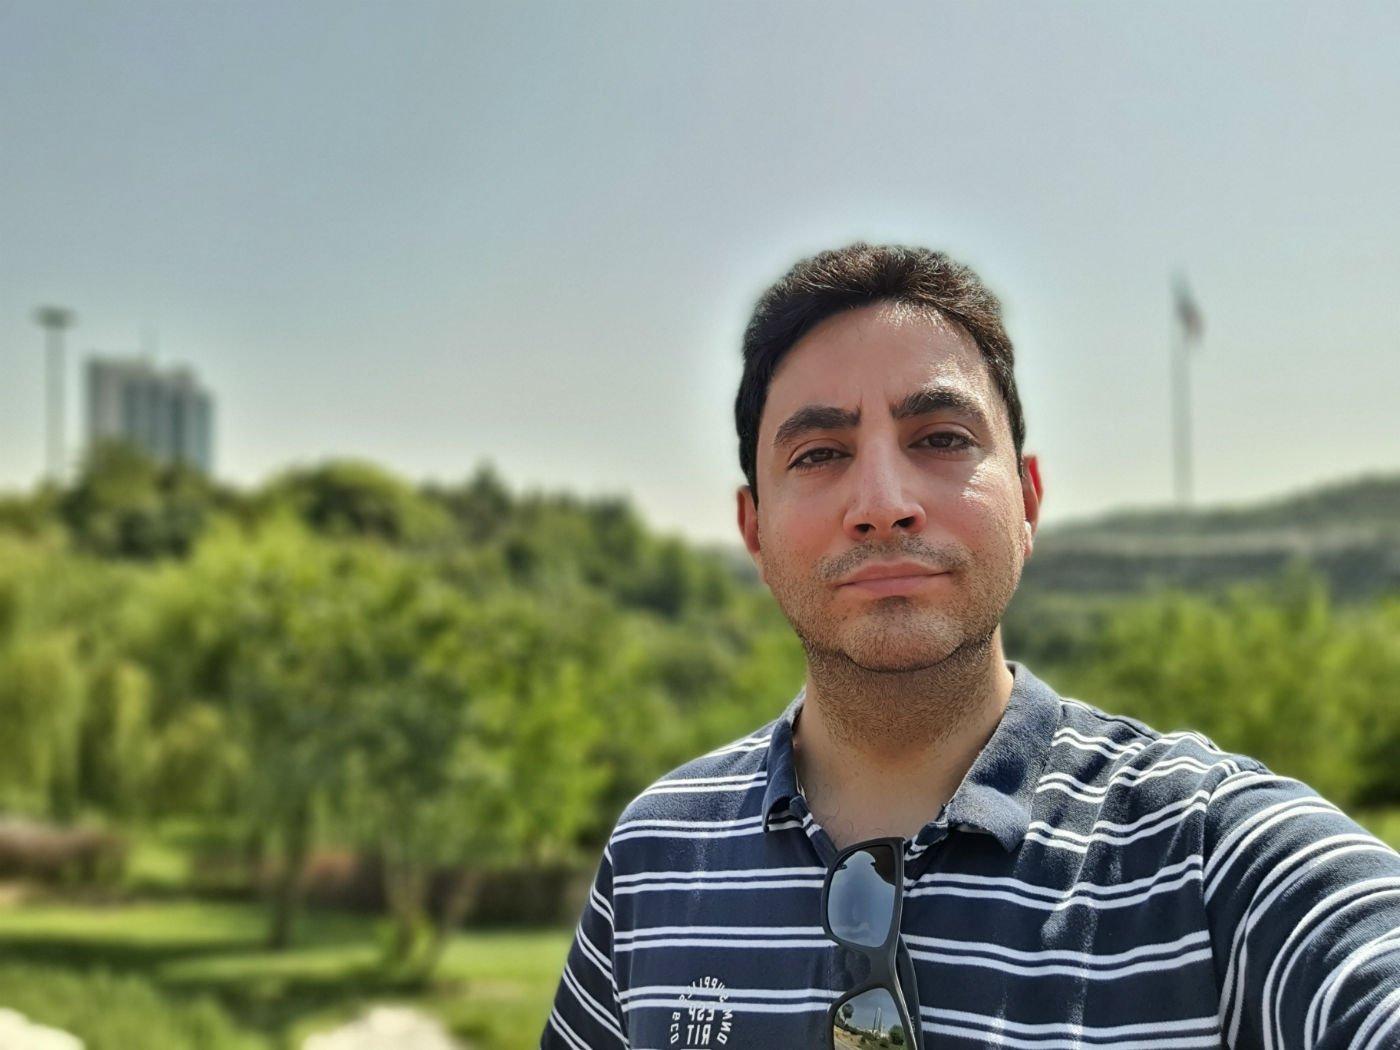 GalaxyNote10Lite Selfie 11 w1400 بررسی سامسونگ گلکسی نوت ۱۰ لایت؛ اولین عضو میانرده از خانواده نوت اخبار IT